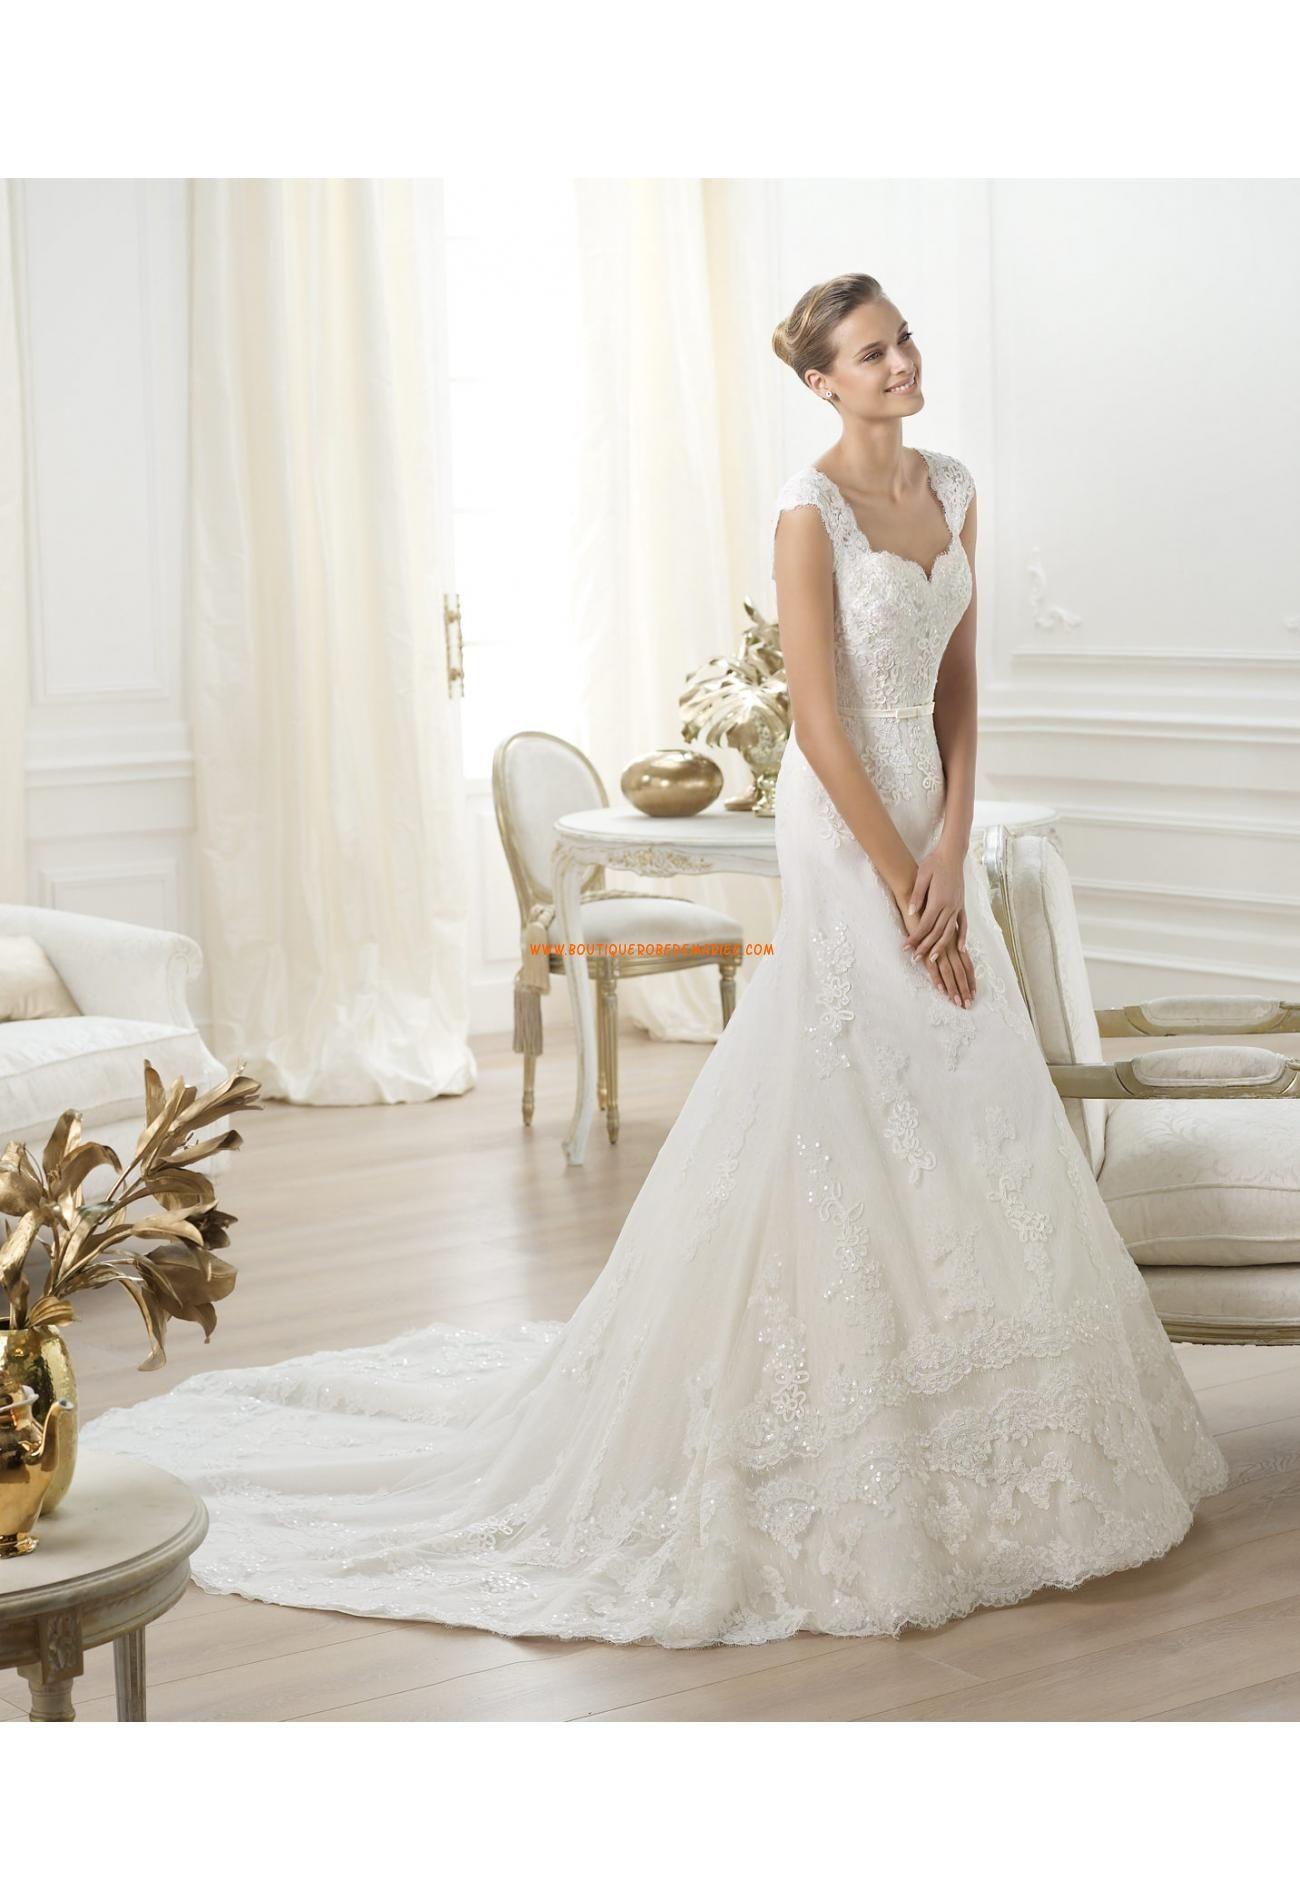 robe de mari e tulle dentelle avec bretelles robe de mari e 2014 robe de mari e 2014 robe. Black Bedroom Furniture Sets. Home Design Ideas